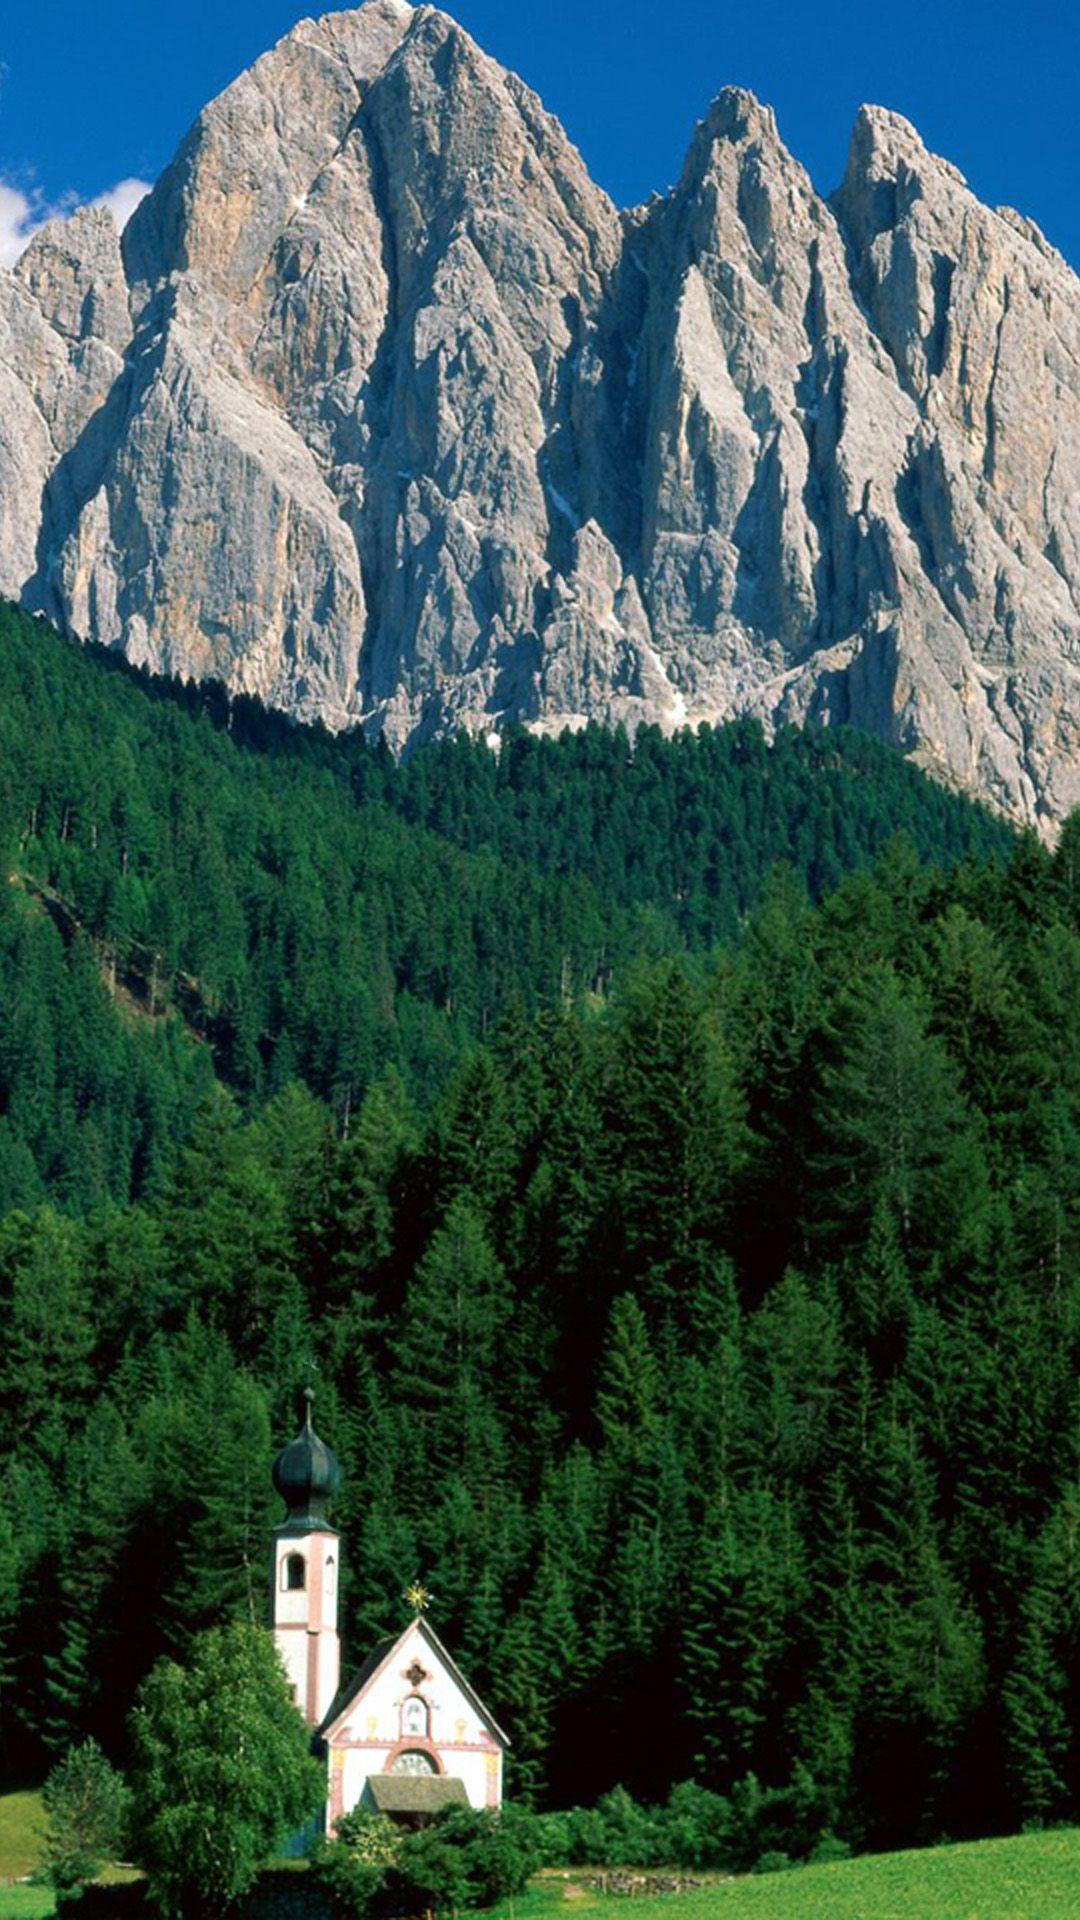 Beautiful Wallpaper Mountain Galaxy S5 - a5e0ef307698d8dcea673647974e3571  Perfect Image Reference_94837.jpg